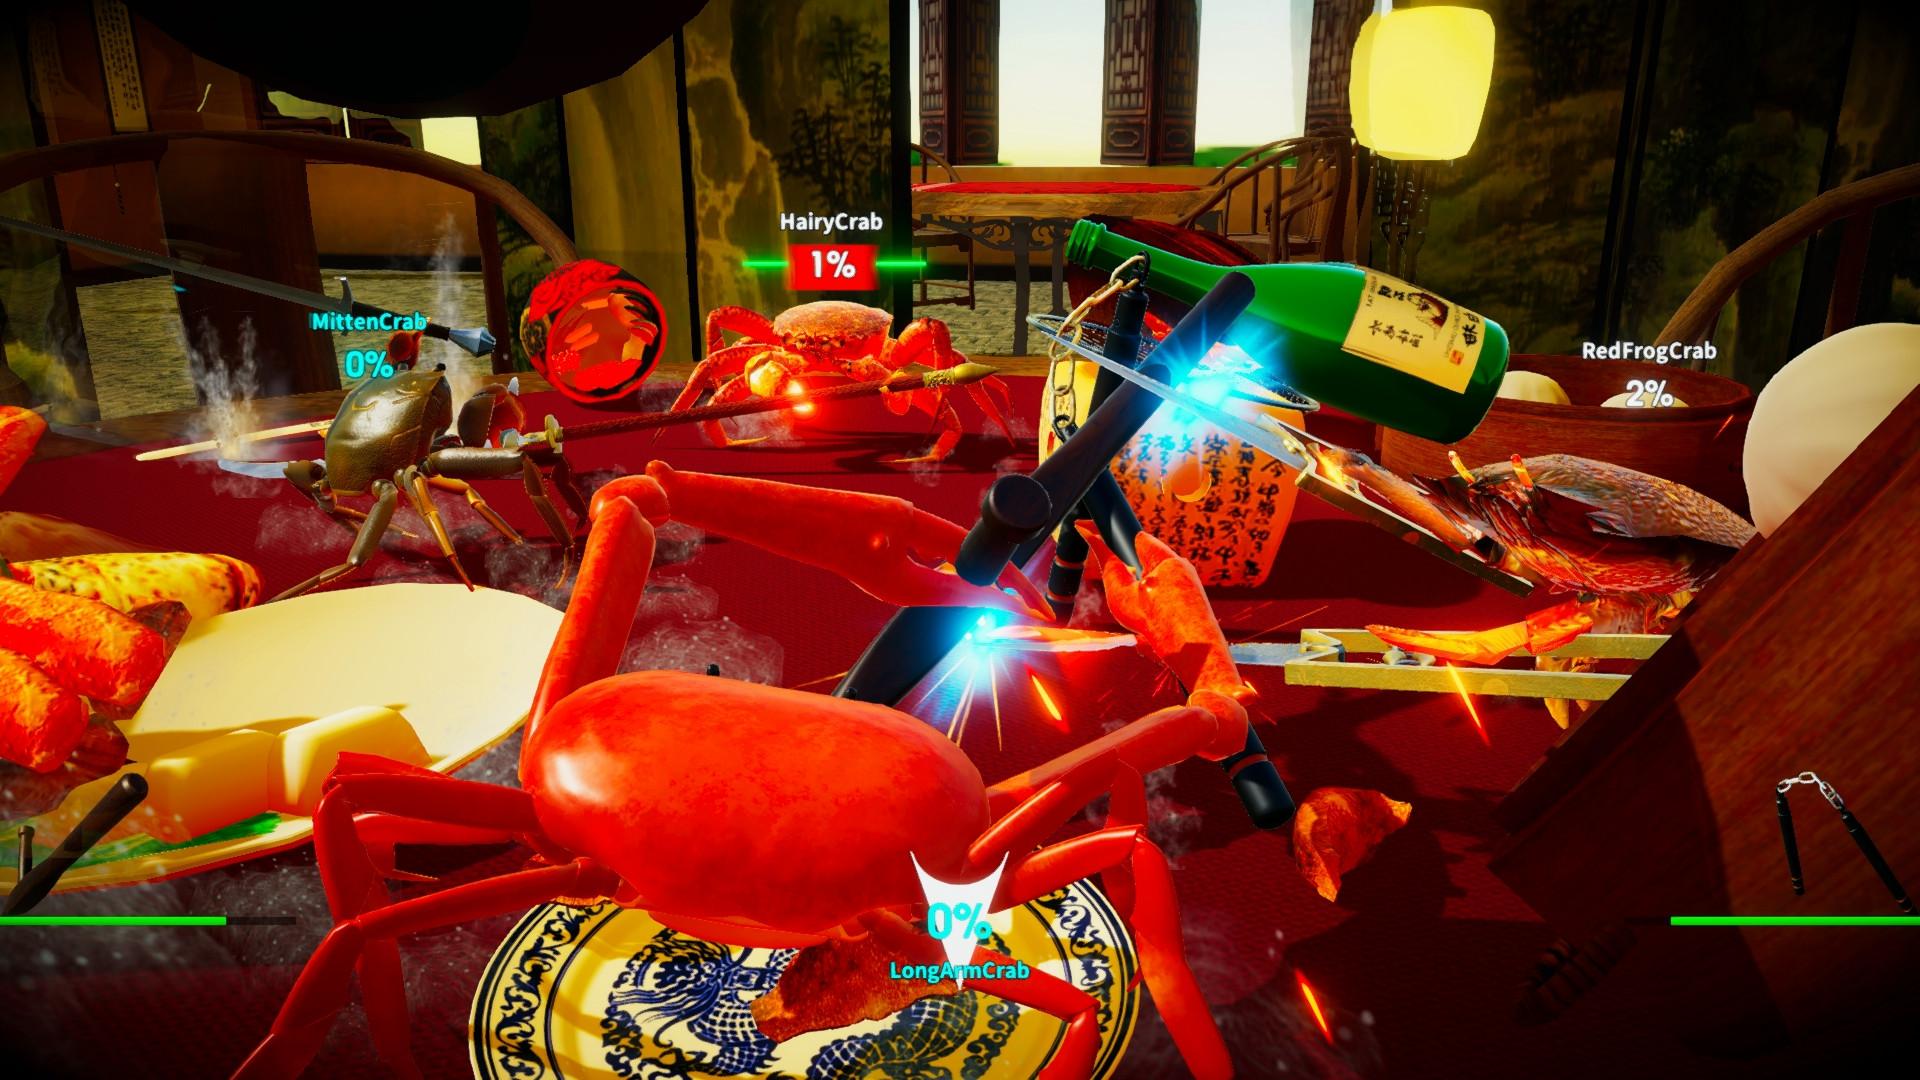 螃蟹大战/Fight Crab